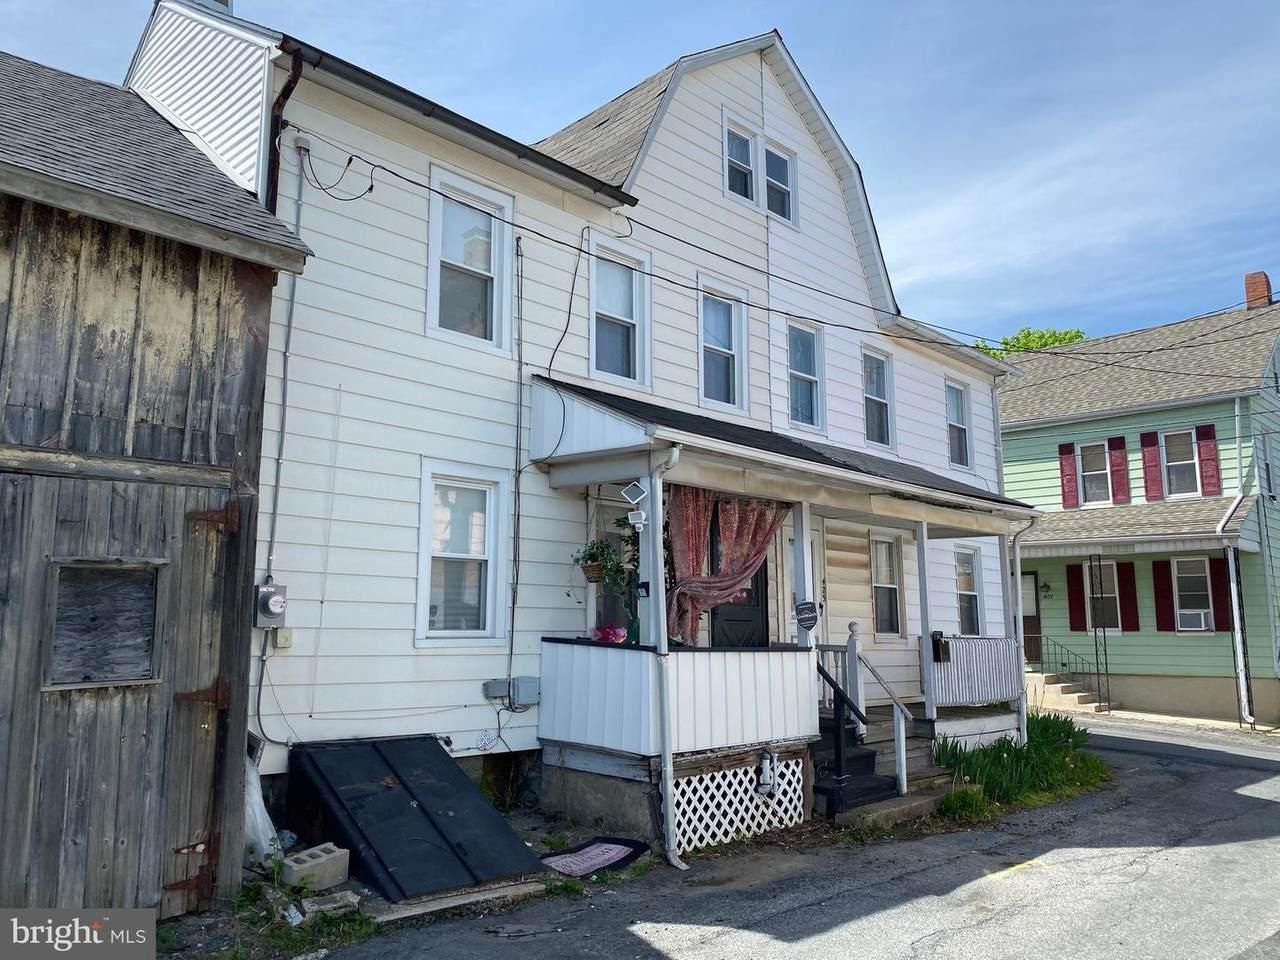 427 Stanley Street - Photo 1